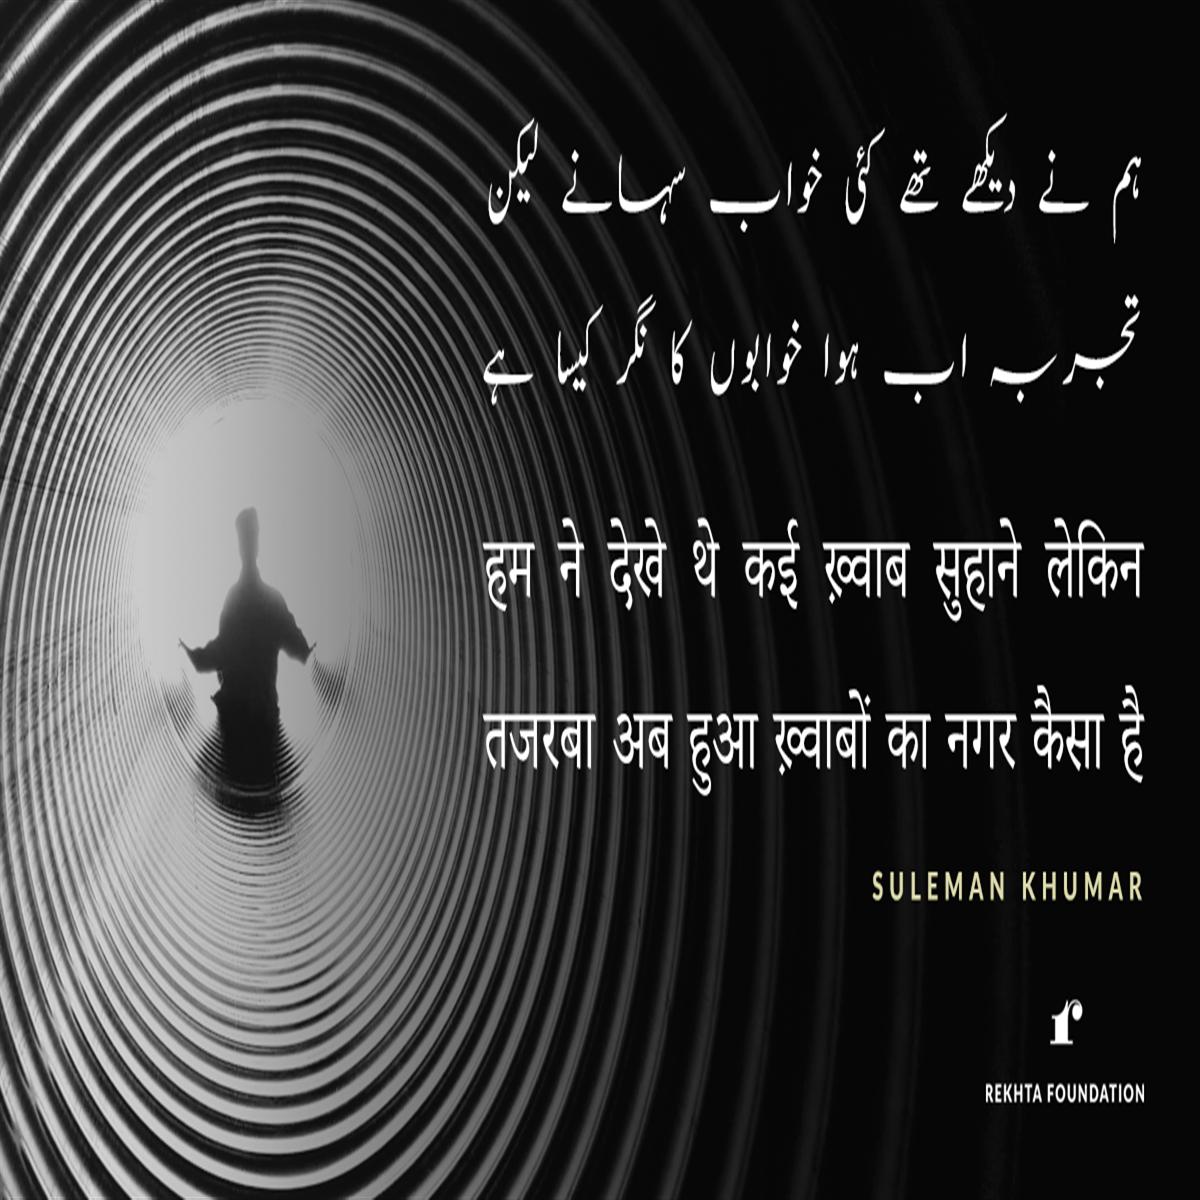 Suleman Khumar